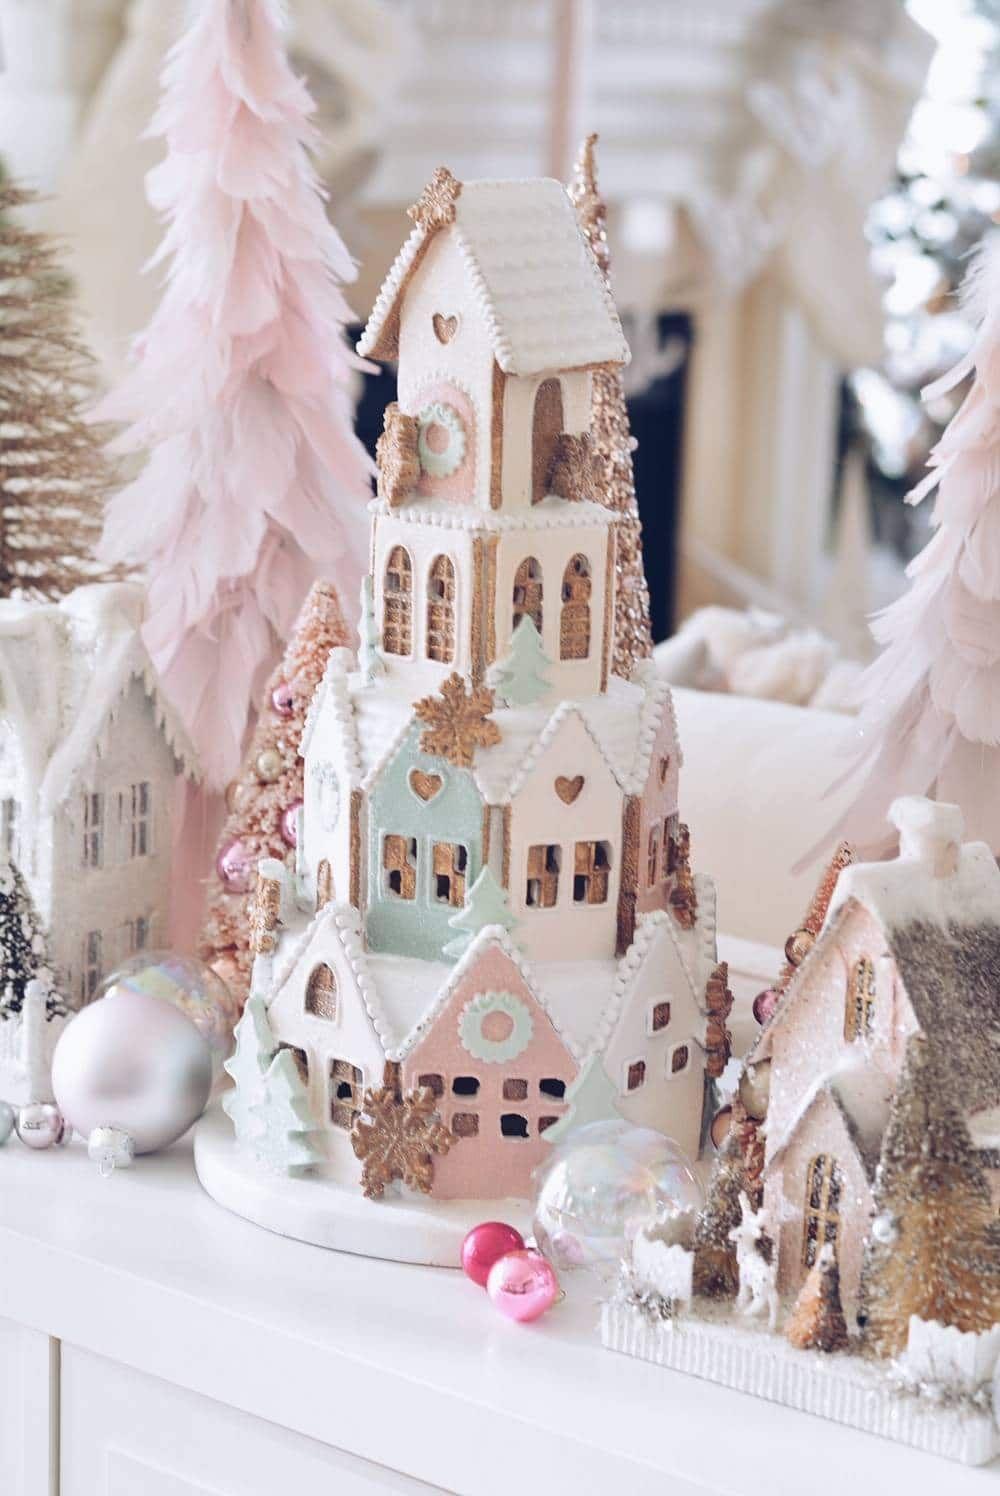 A Pink Christmas Wonderland Gingerbread House Gingerbread Village Christmas Decora Pink Christmas Decorations Christmas Wonderland Pink Christmas Background